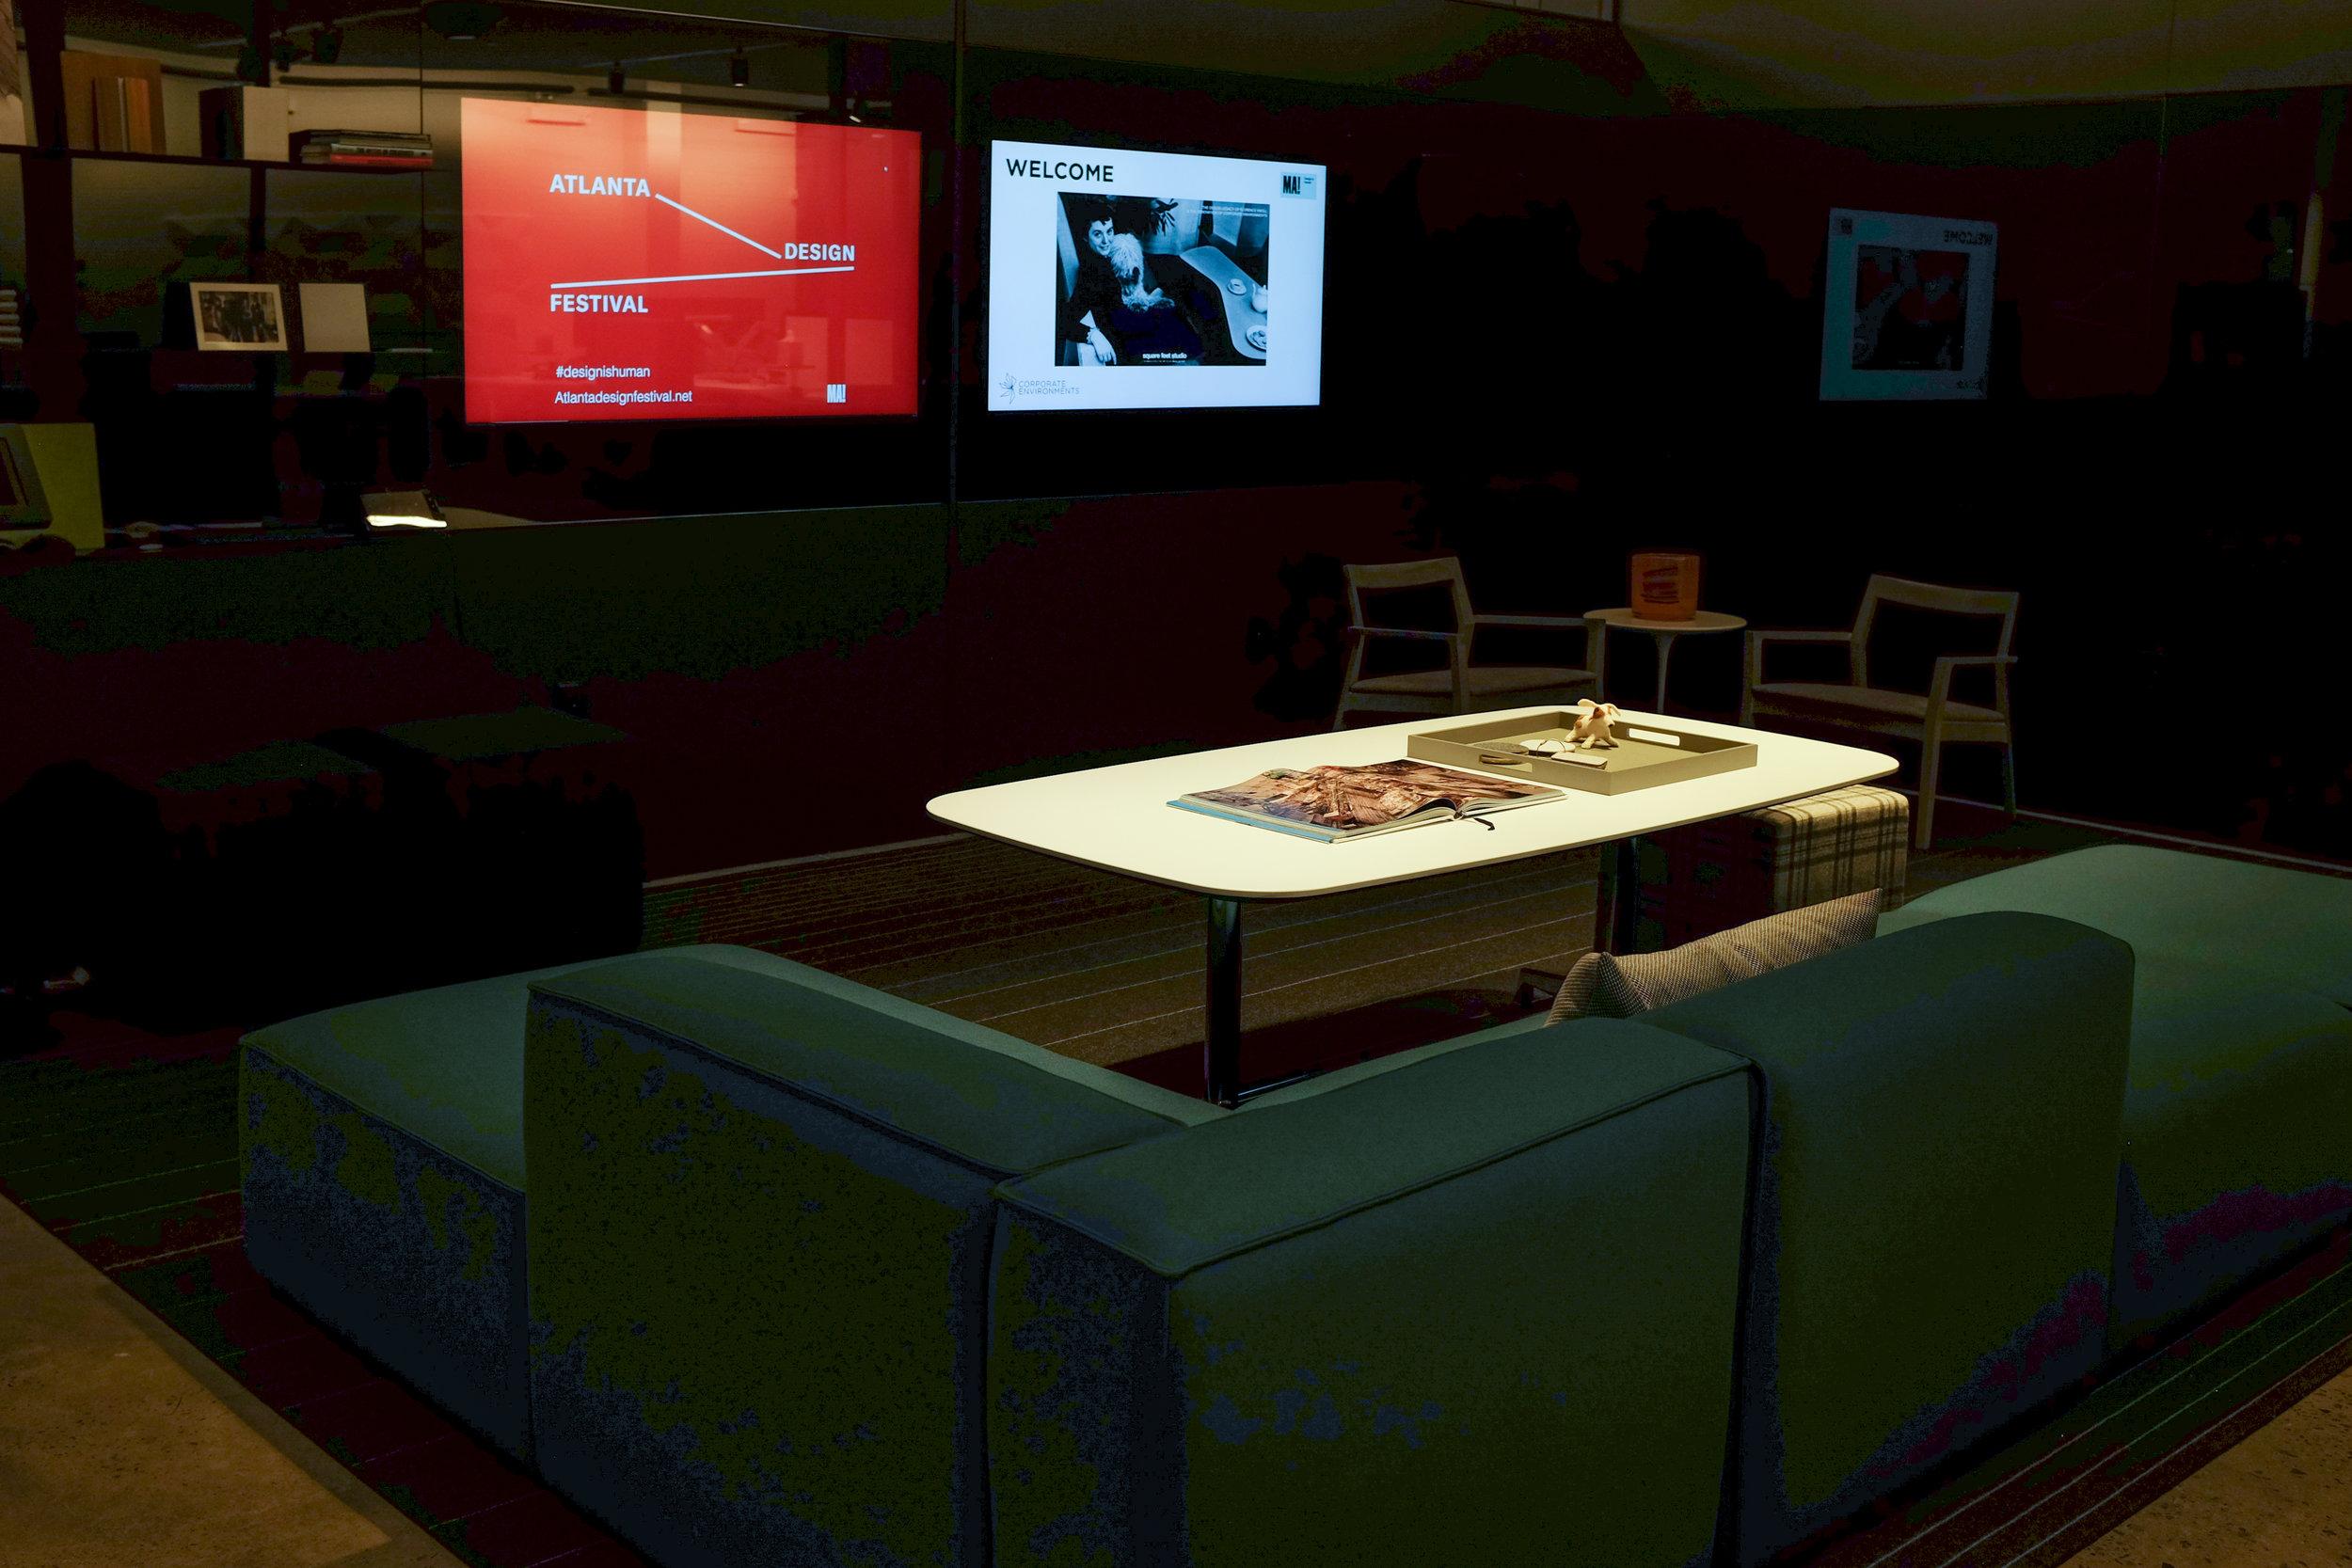 Studio-Verena-Hennig-Atlanta-Design-Festival-Branding.jpg